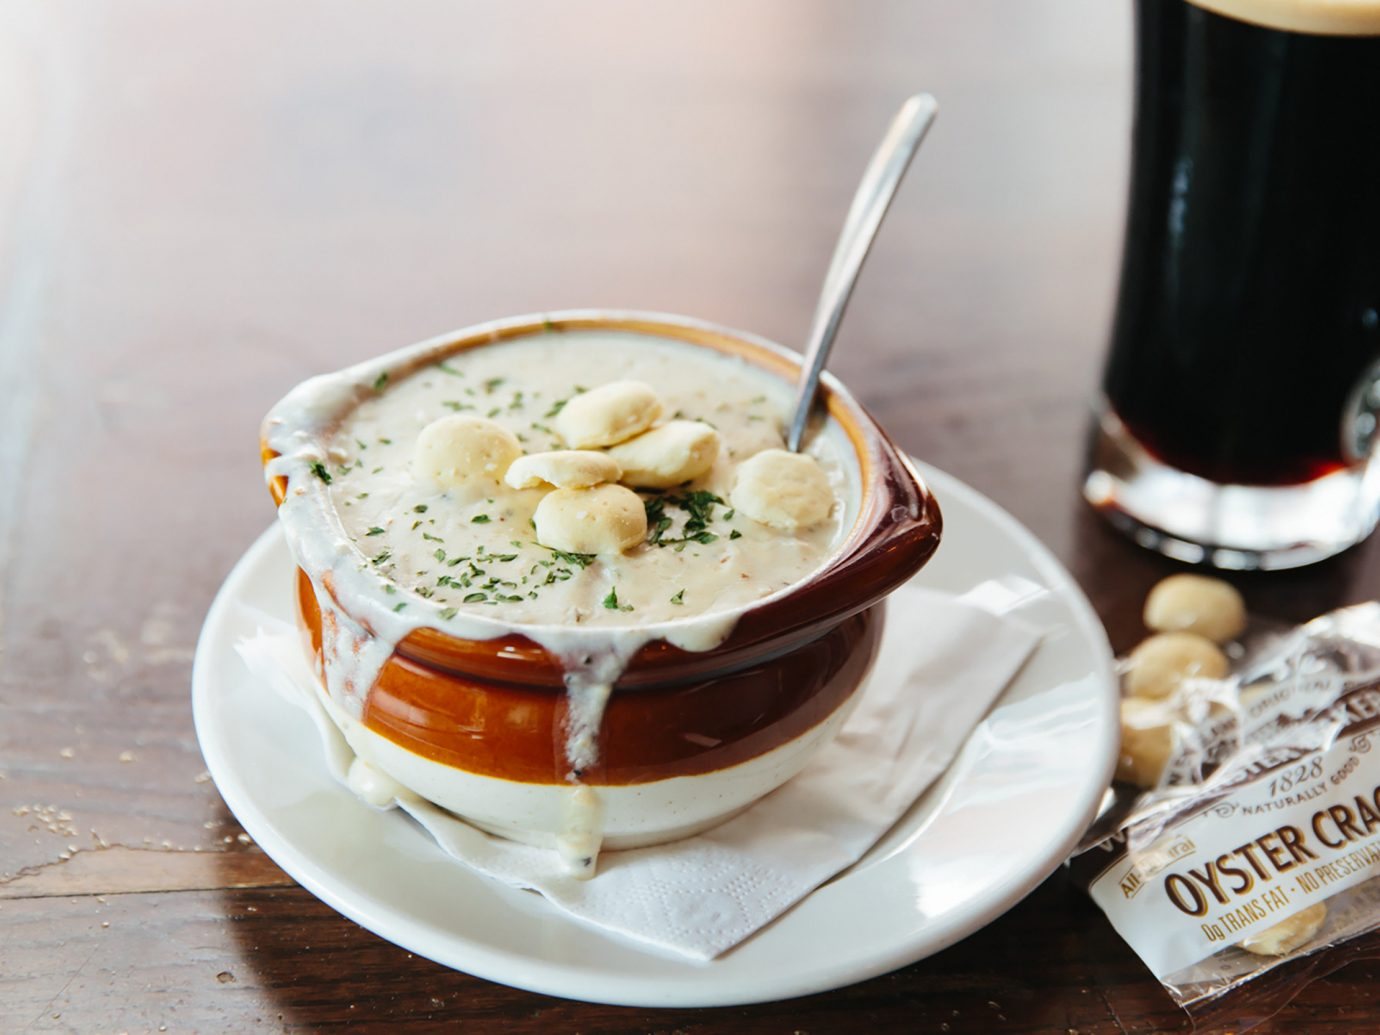 Trip Ideas table food cup dish coffee plate dessert Drink meal breakfast produce cuisine flavor